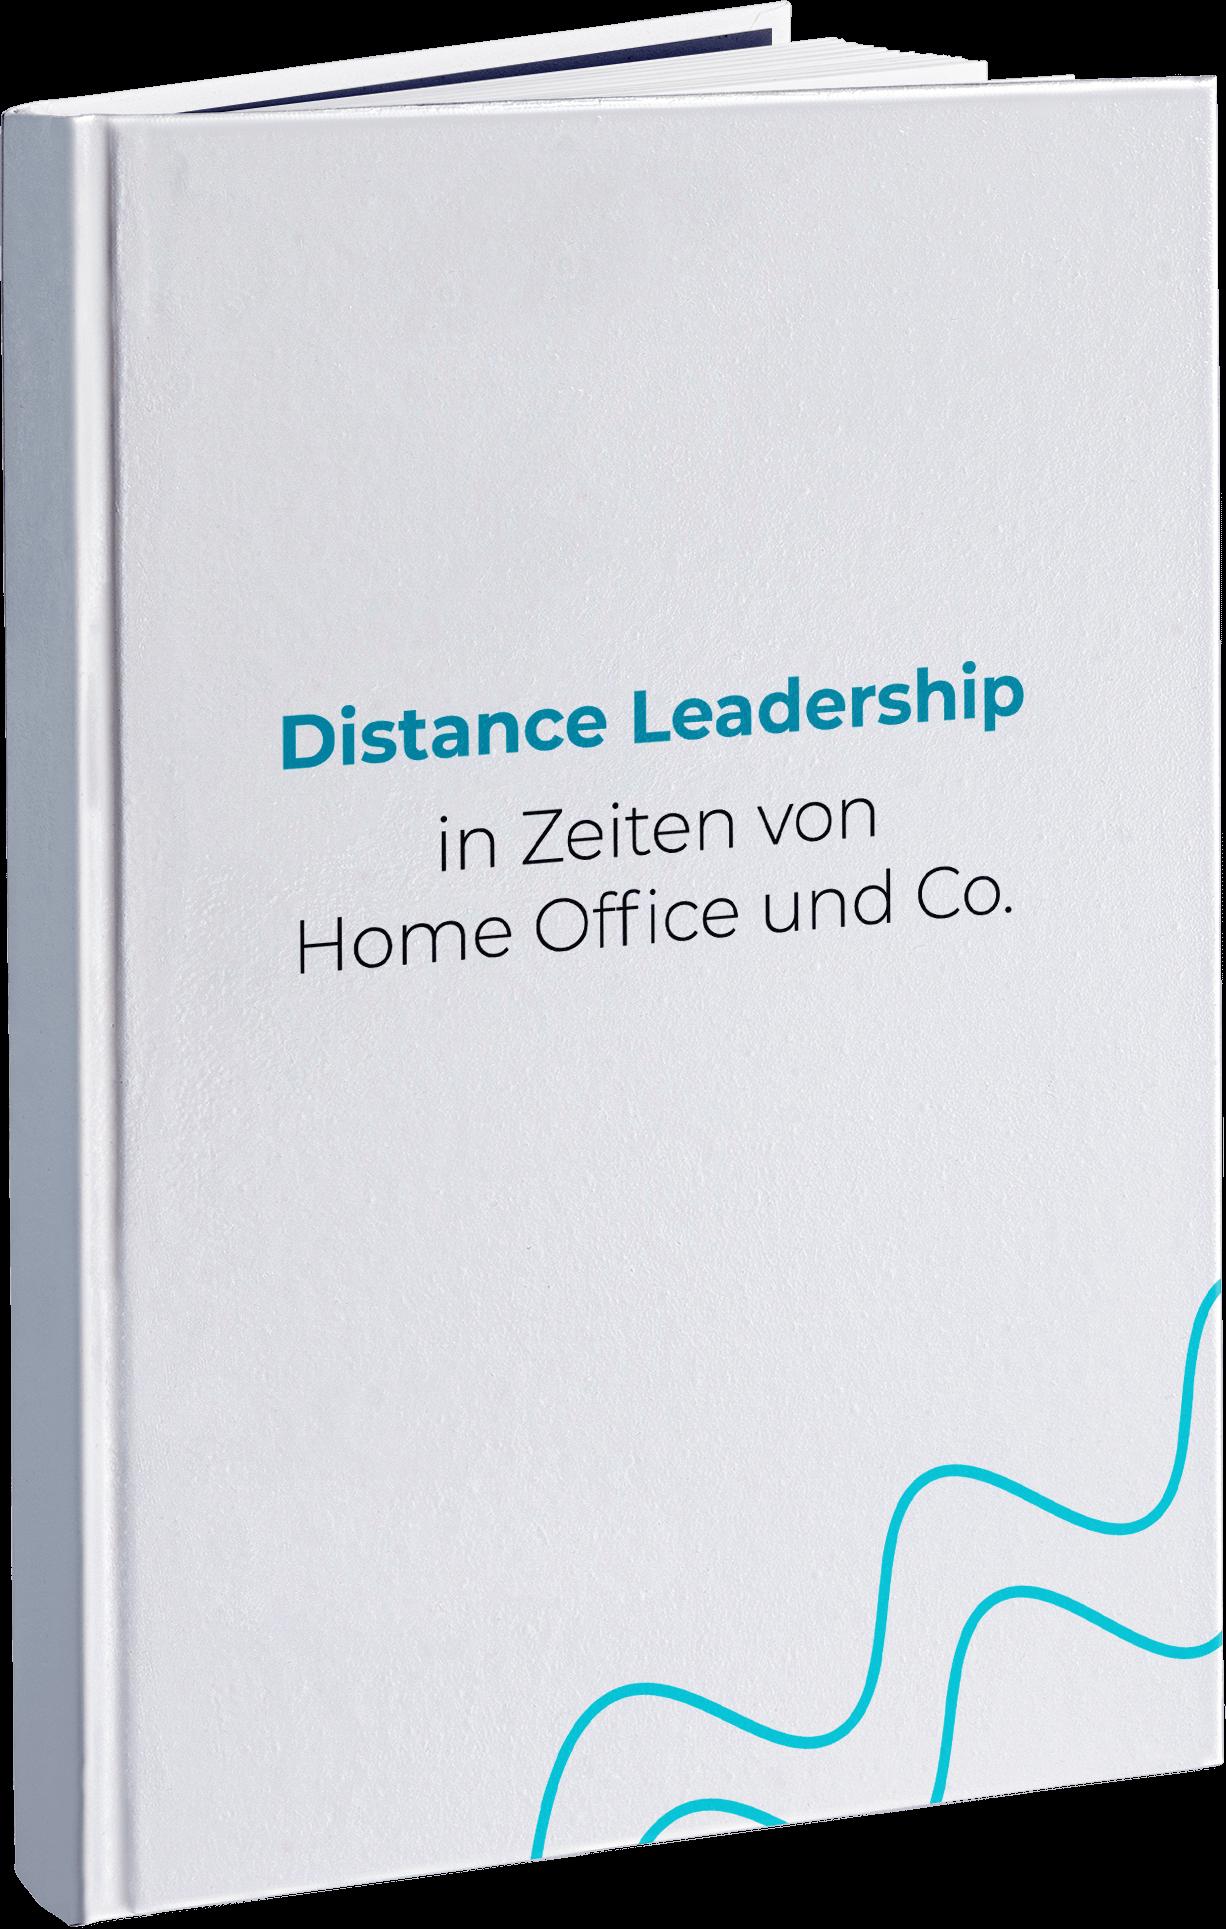 DistanceLeadership